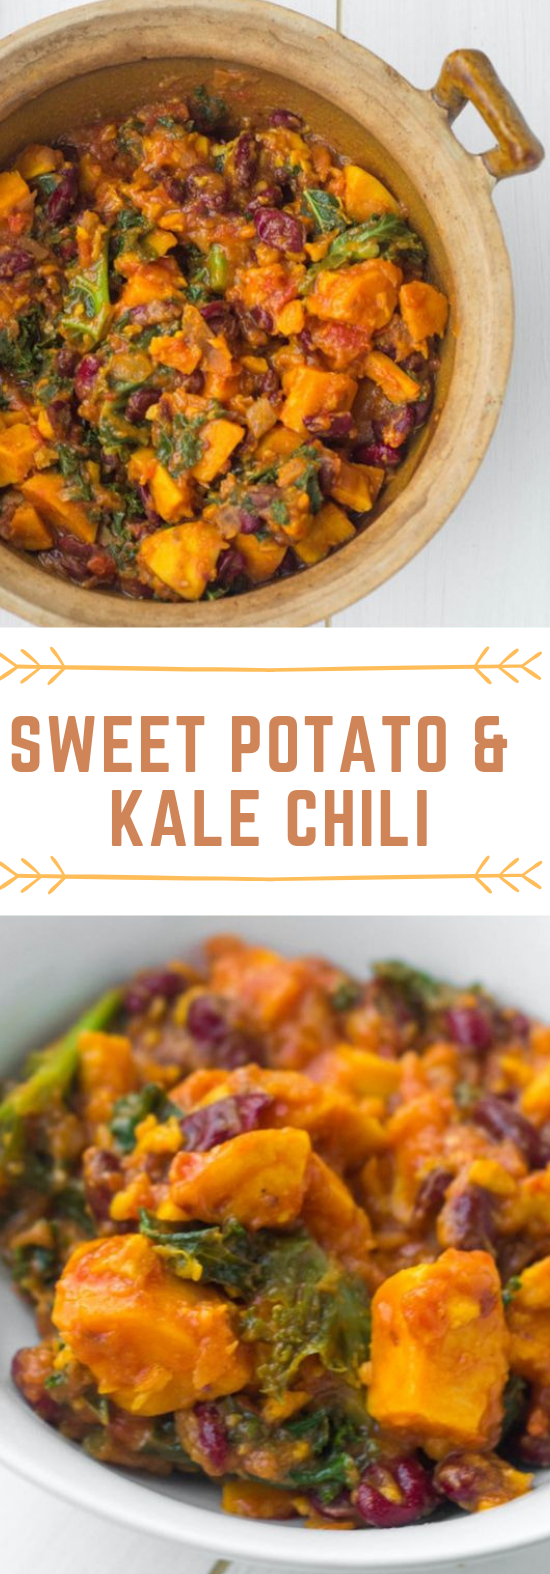 SWEET POTATO & KALE CHILI #vegan #potato